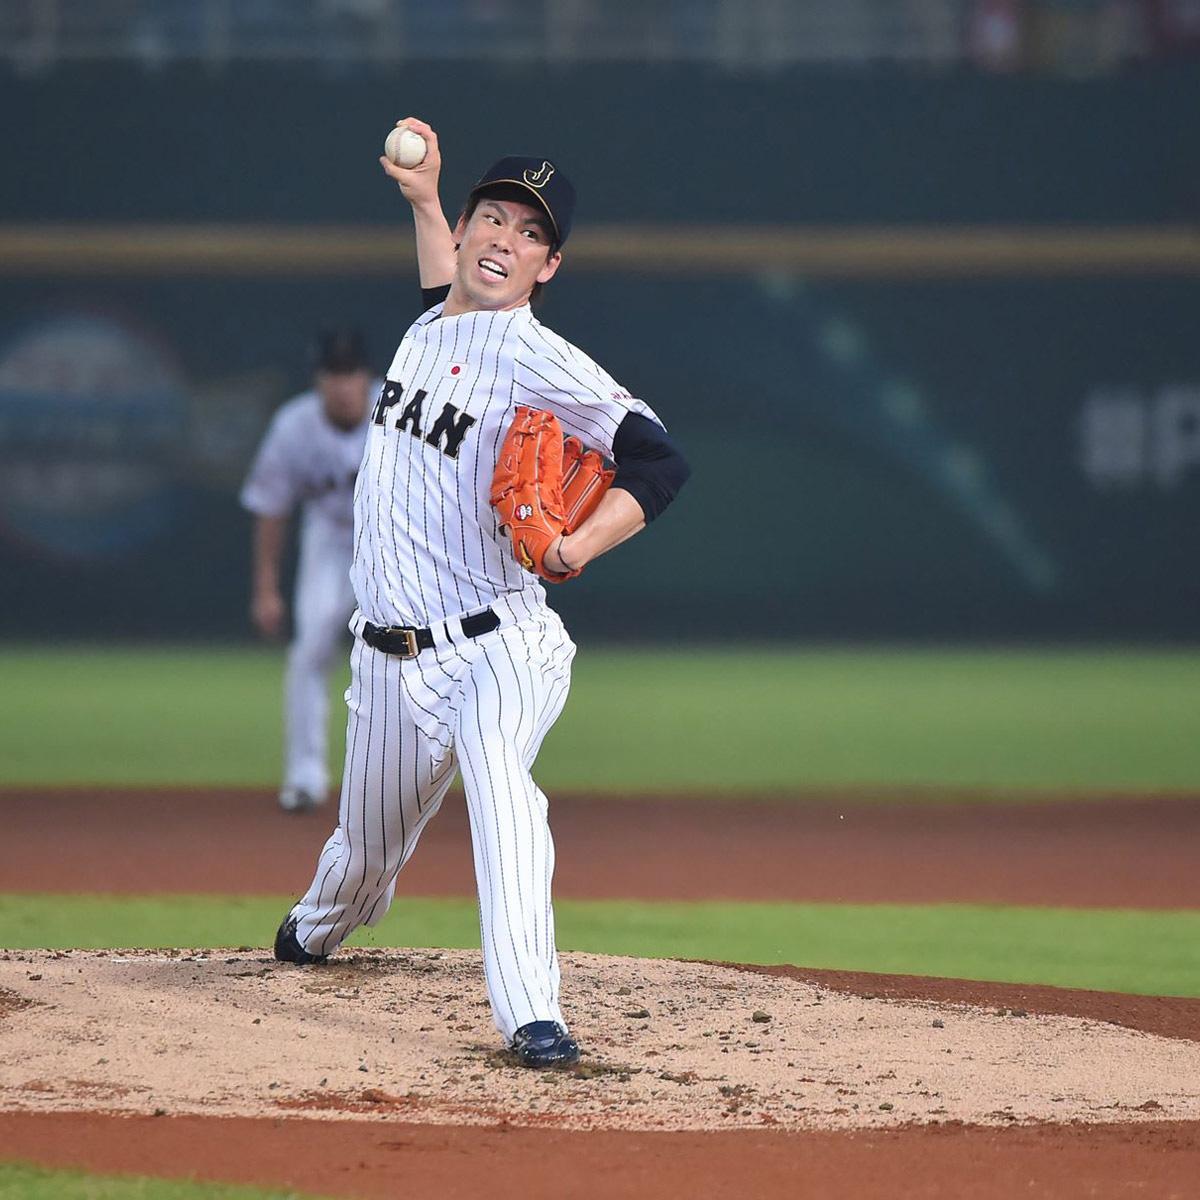 Japan National Team ace Kenta Maeda newest member of MLB's Dodgers